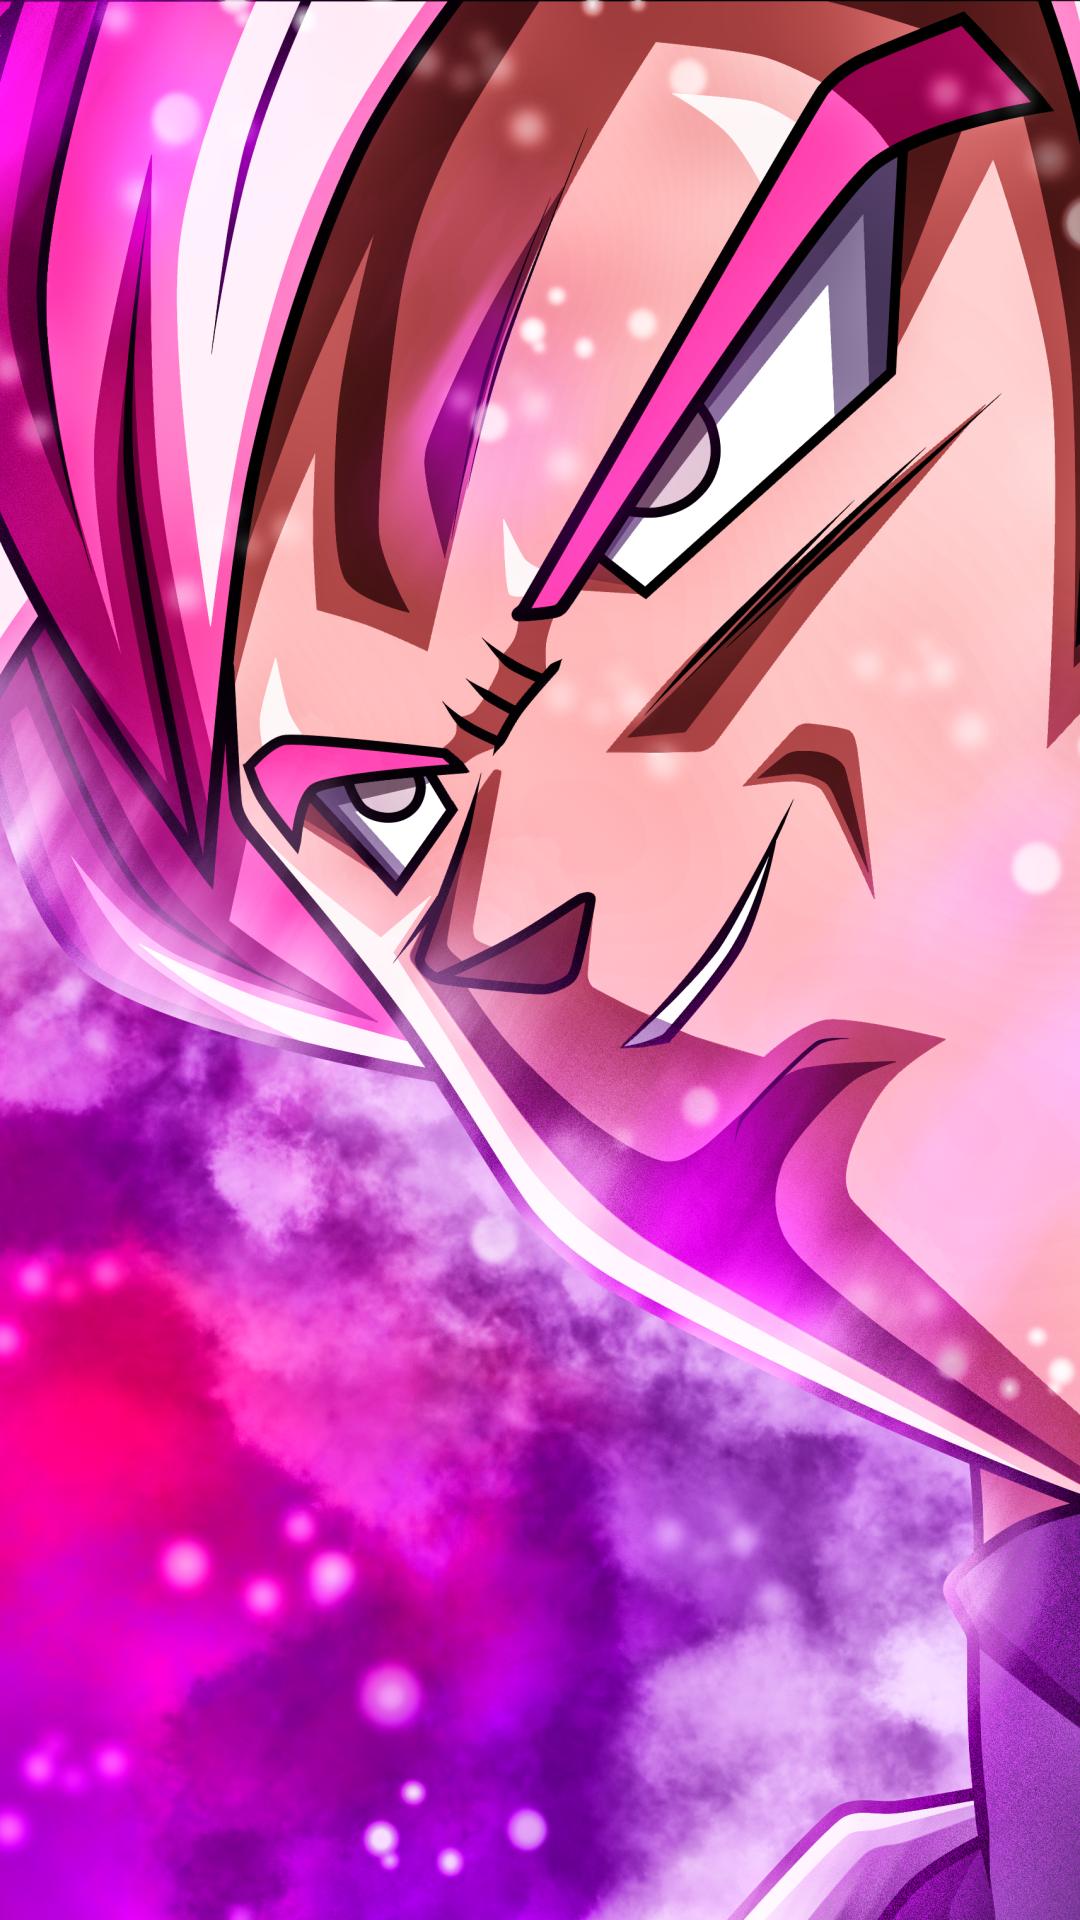 Anime dragon ball super 1080x1920 wallpaper id 702181 mobile abyss - Dragon ball super wallpaper 1080x1920 ...